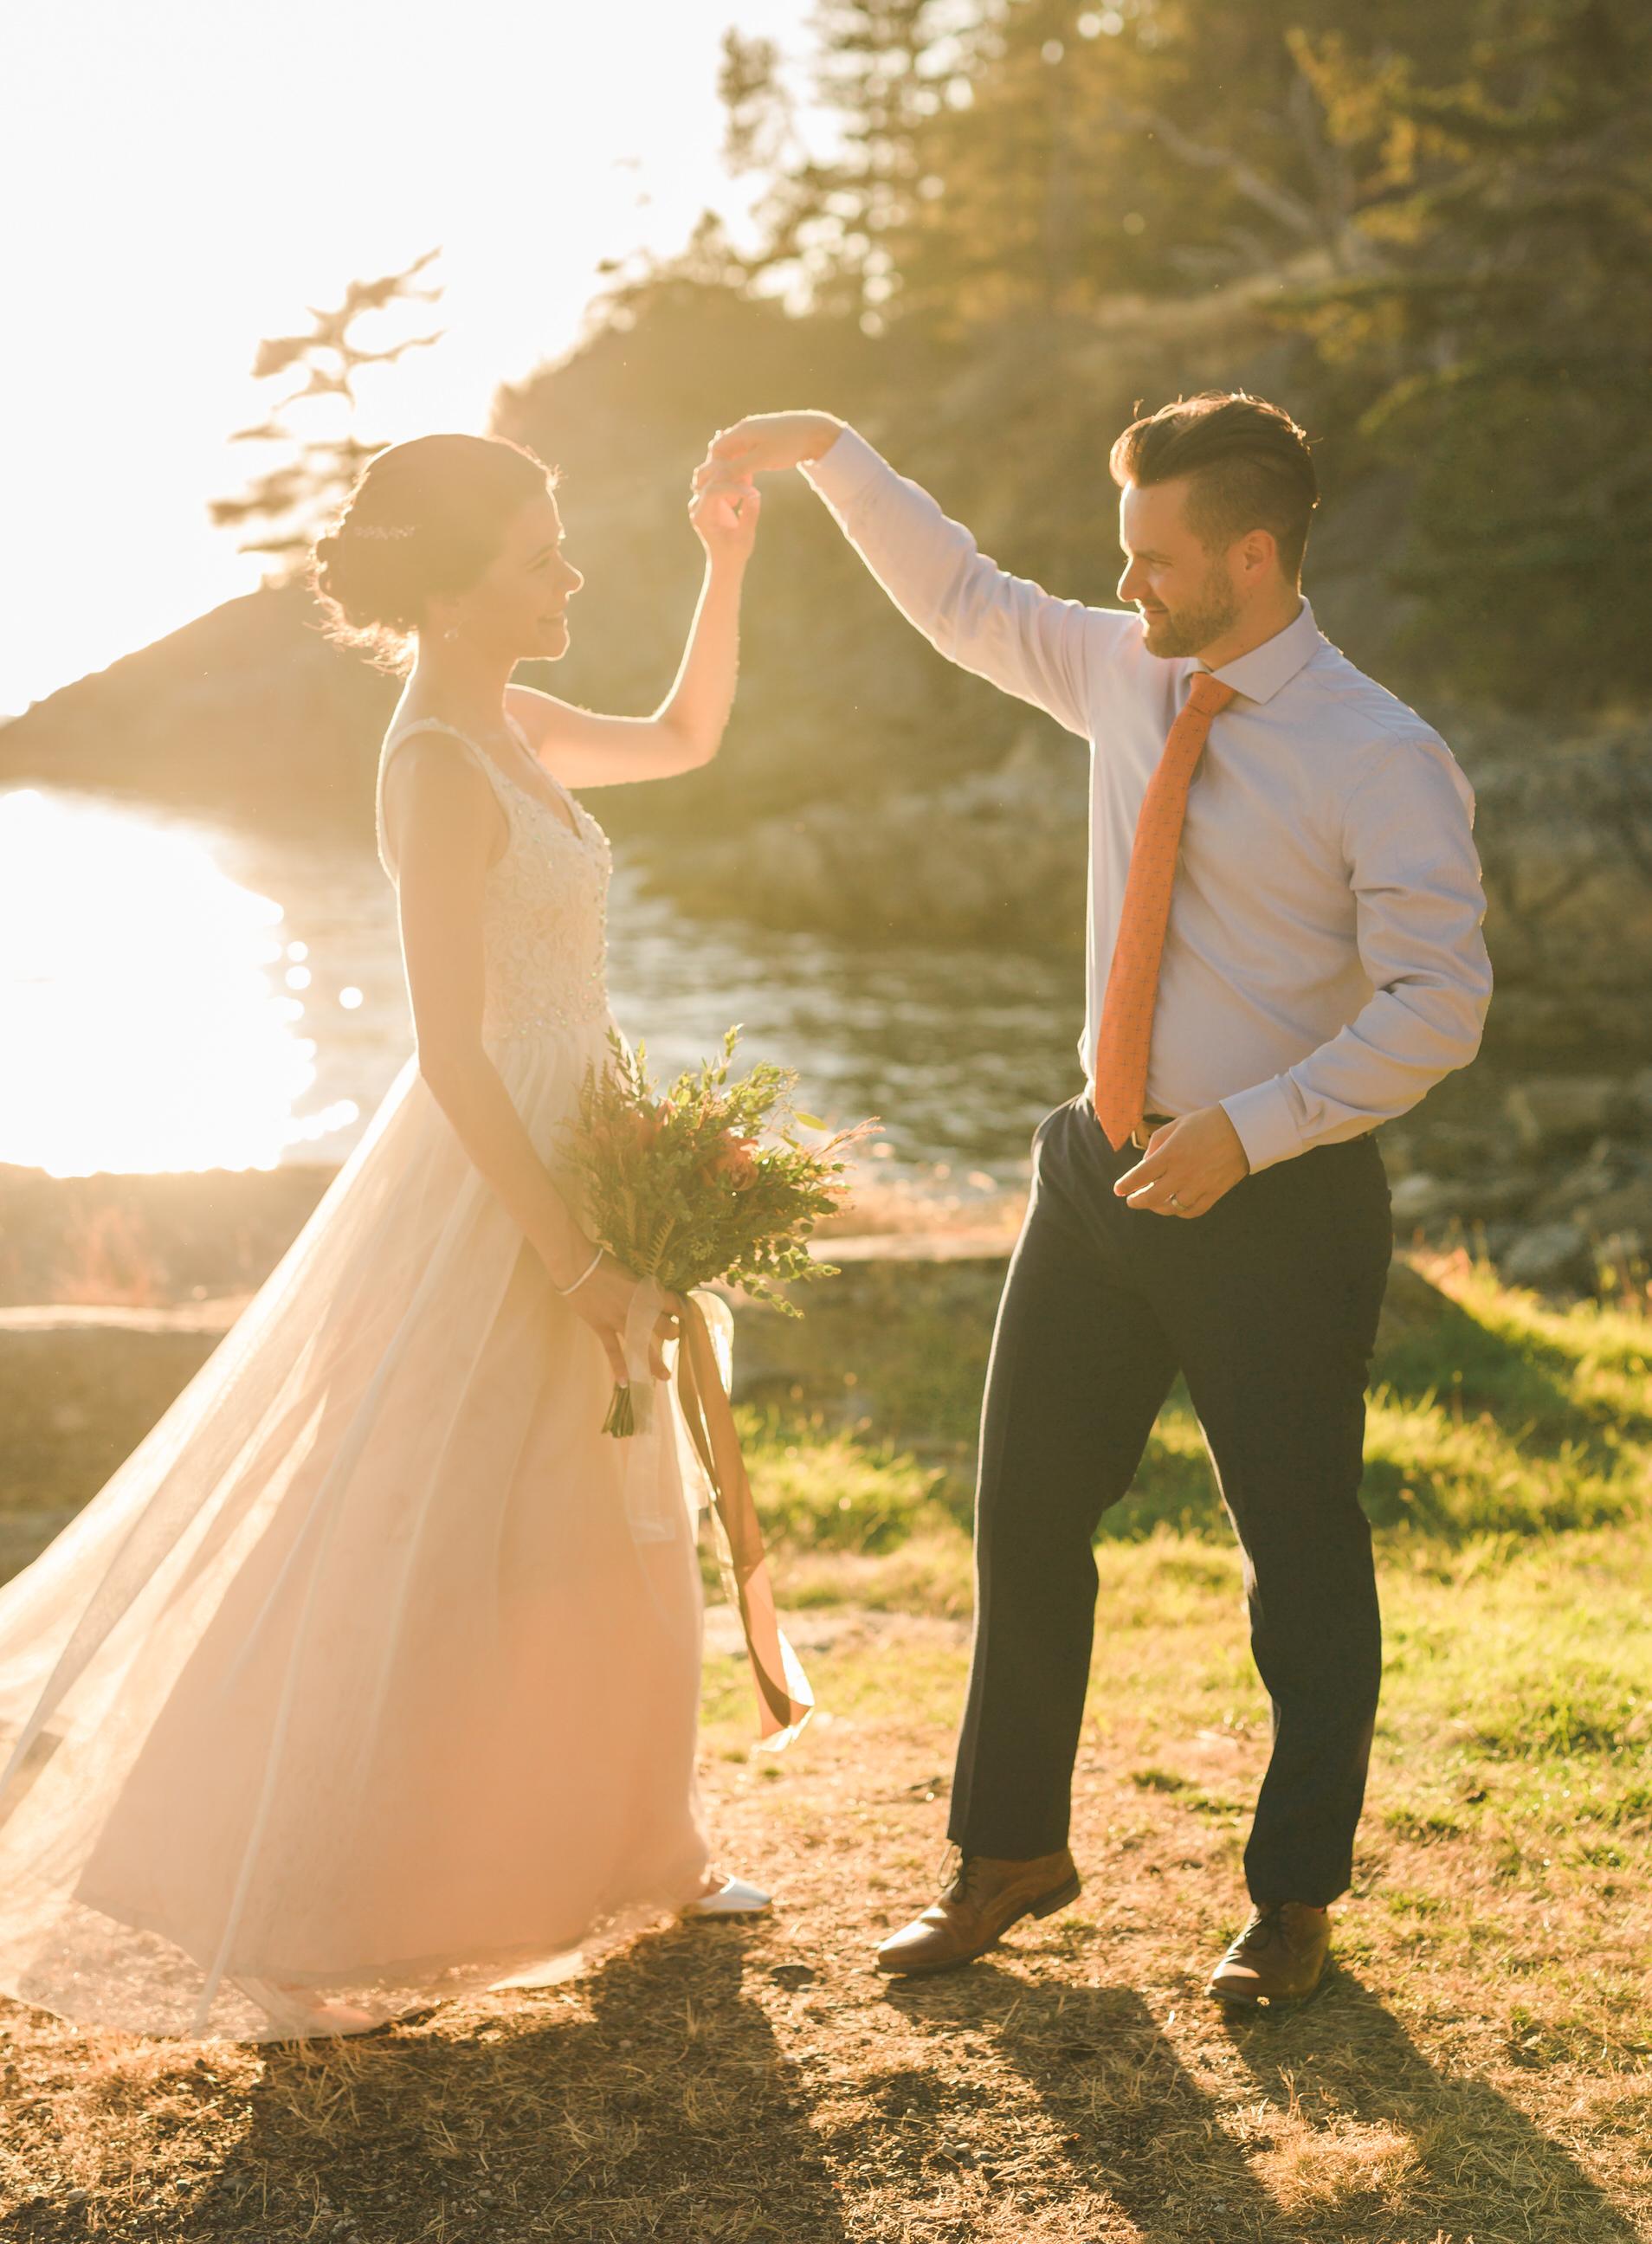 Rockwater Secret Cove Resort Wedding - Sunshine Coast BC Wedding Photographer - Vancouver Wedding Photographer - Sunshine Coast Elopement Photos - IMG_1710.jpg